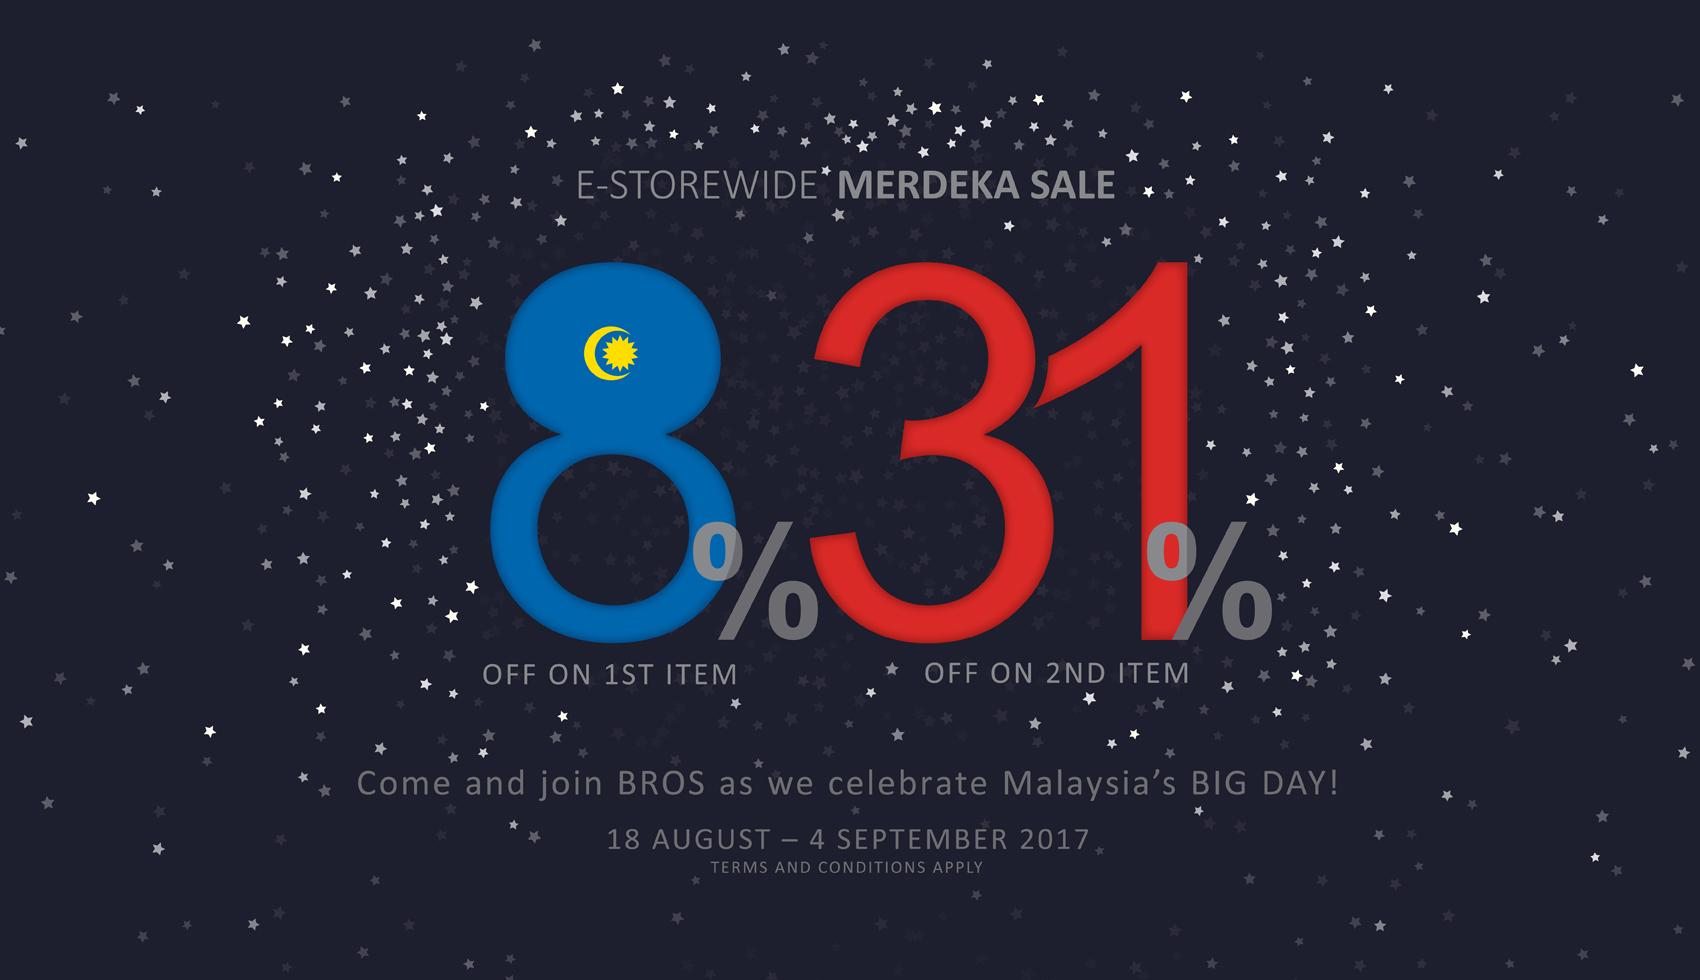 20170814_MERDEKA_PROMOTION_EVENT_HIGHLIGHT